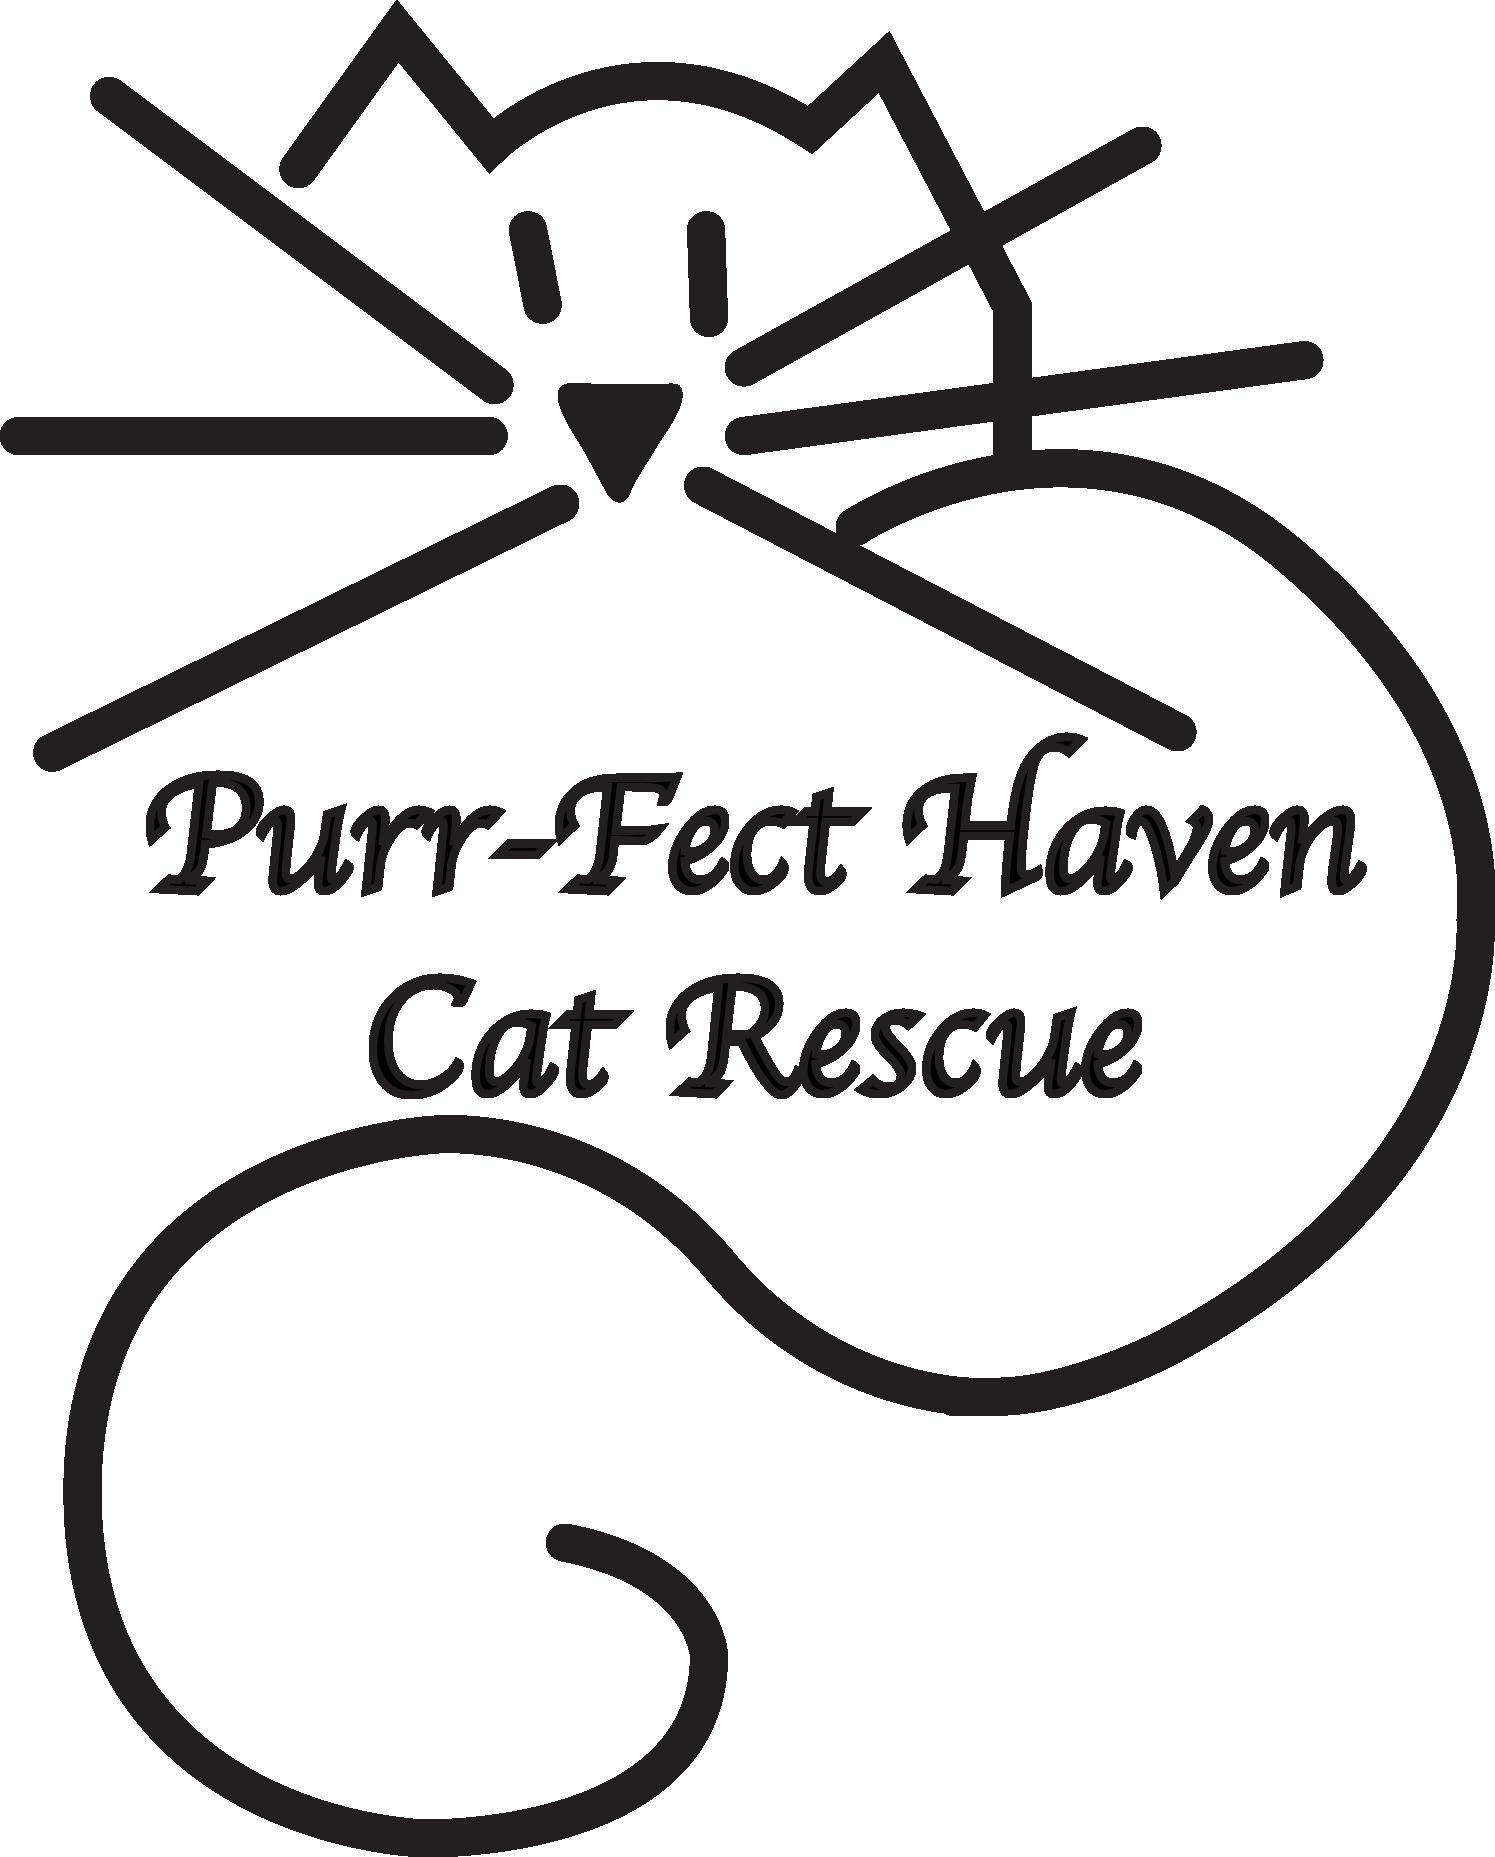 Purrfect Haven Cat Rescue